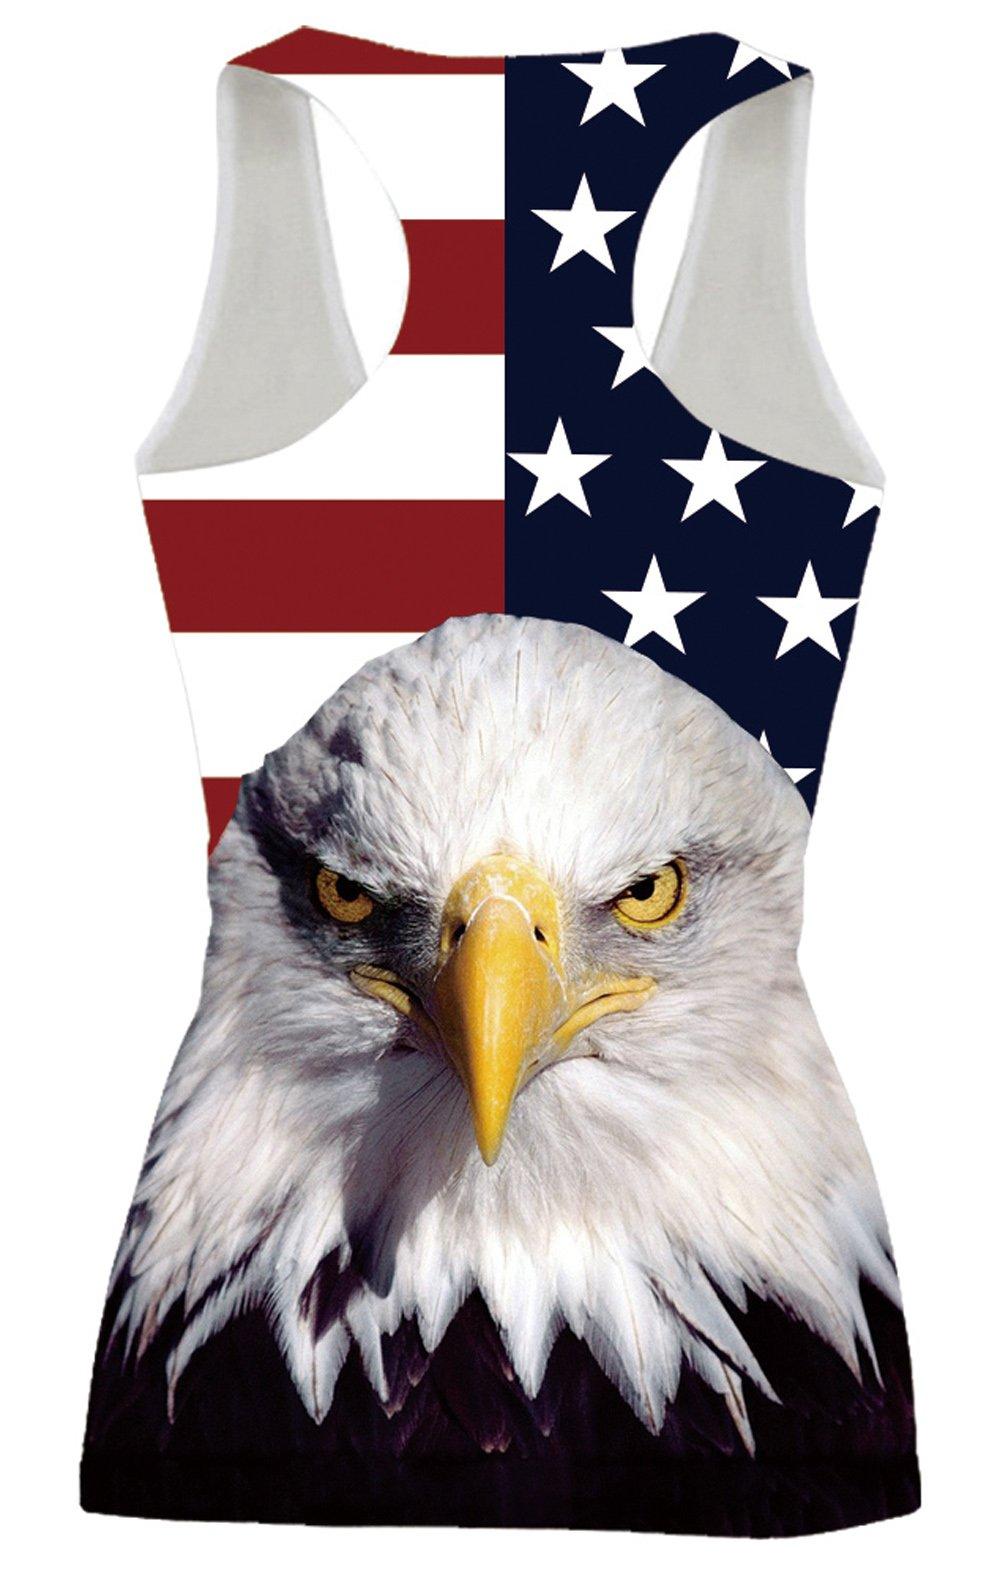 Leapparel Women\'s American Flag Eagle Printed Funny Humor Racerback Tank Top Vest Shirts S